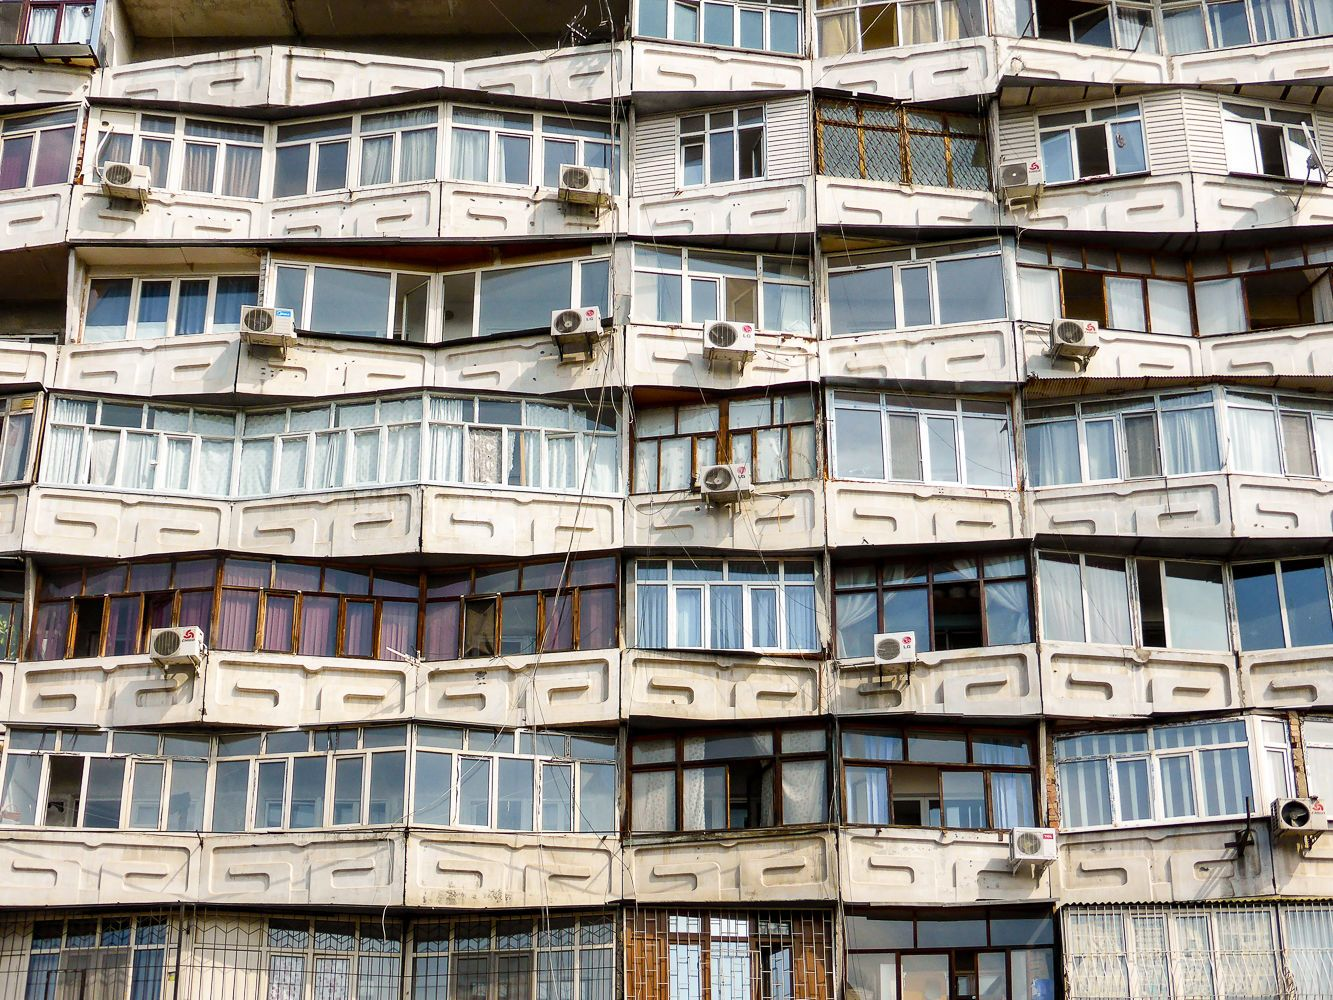 Soviet architecture apartments, Bishkek Travel Guide